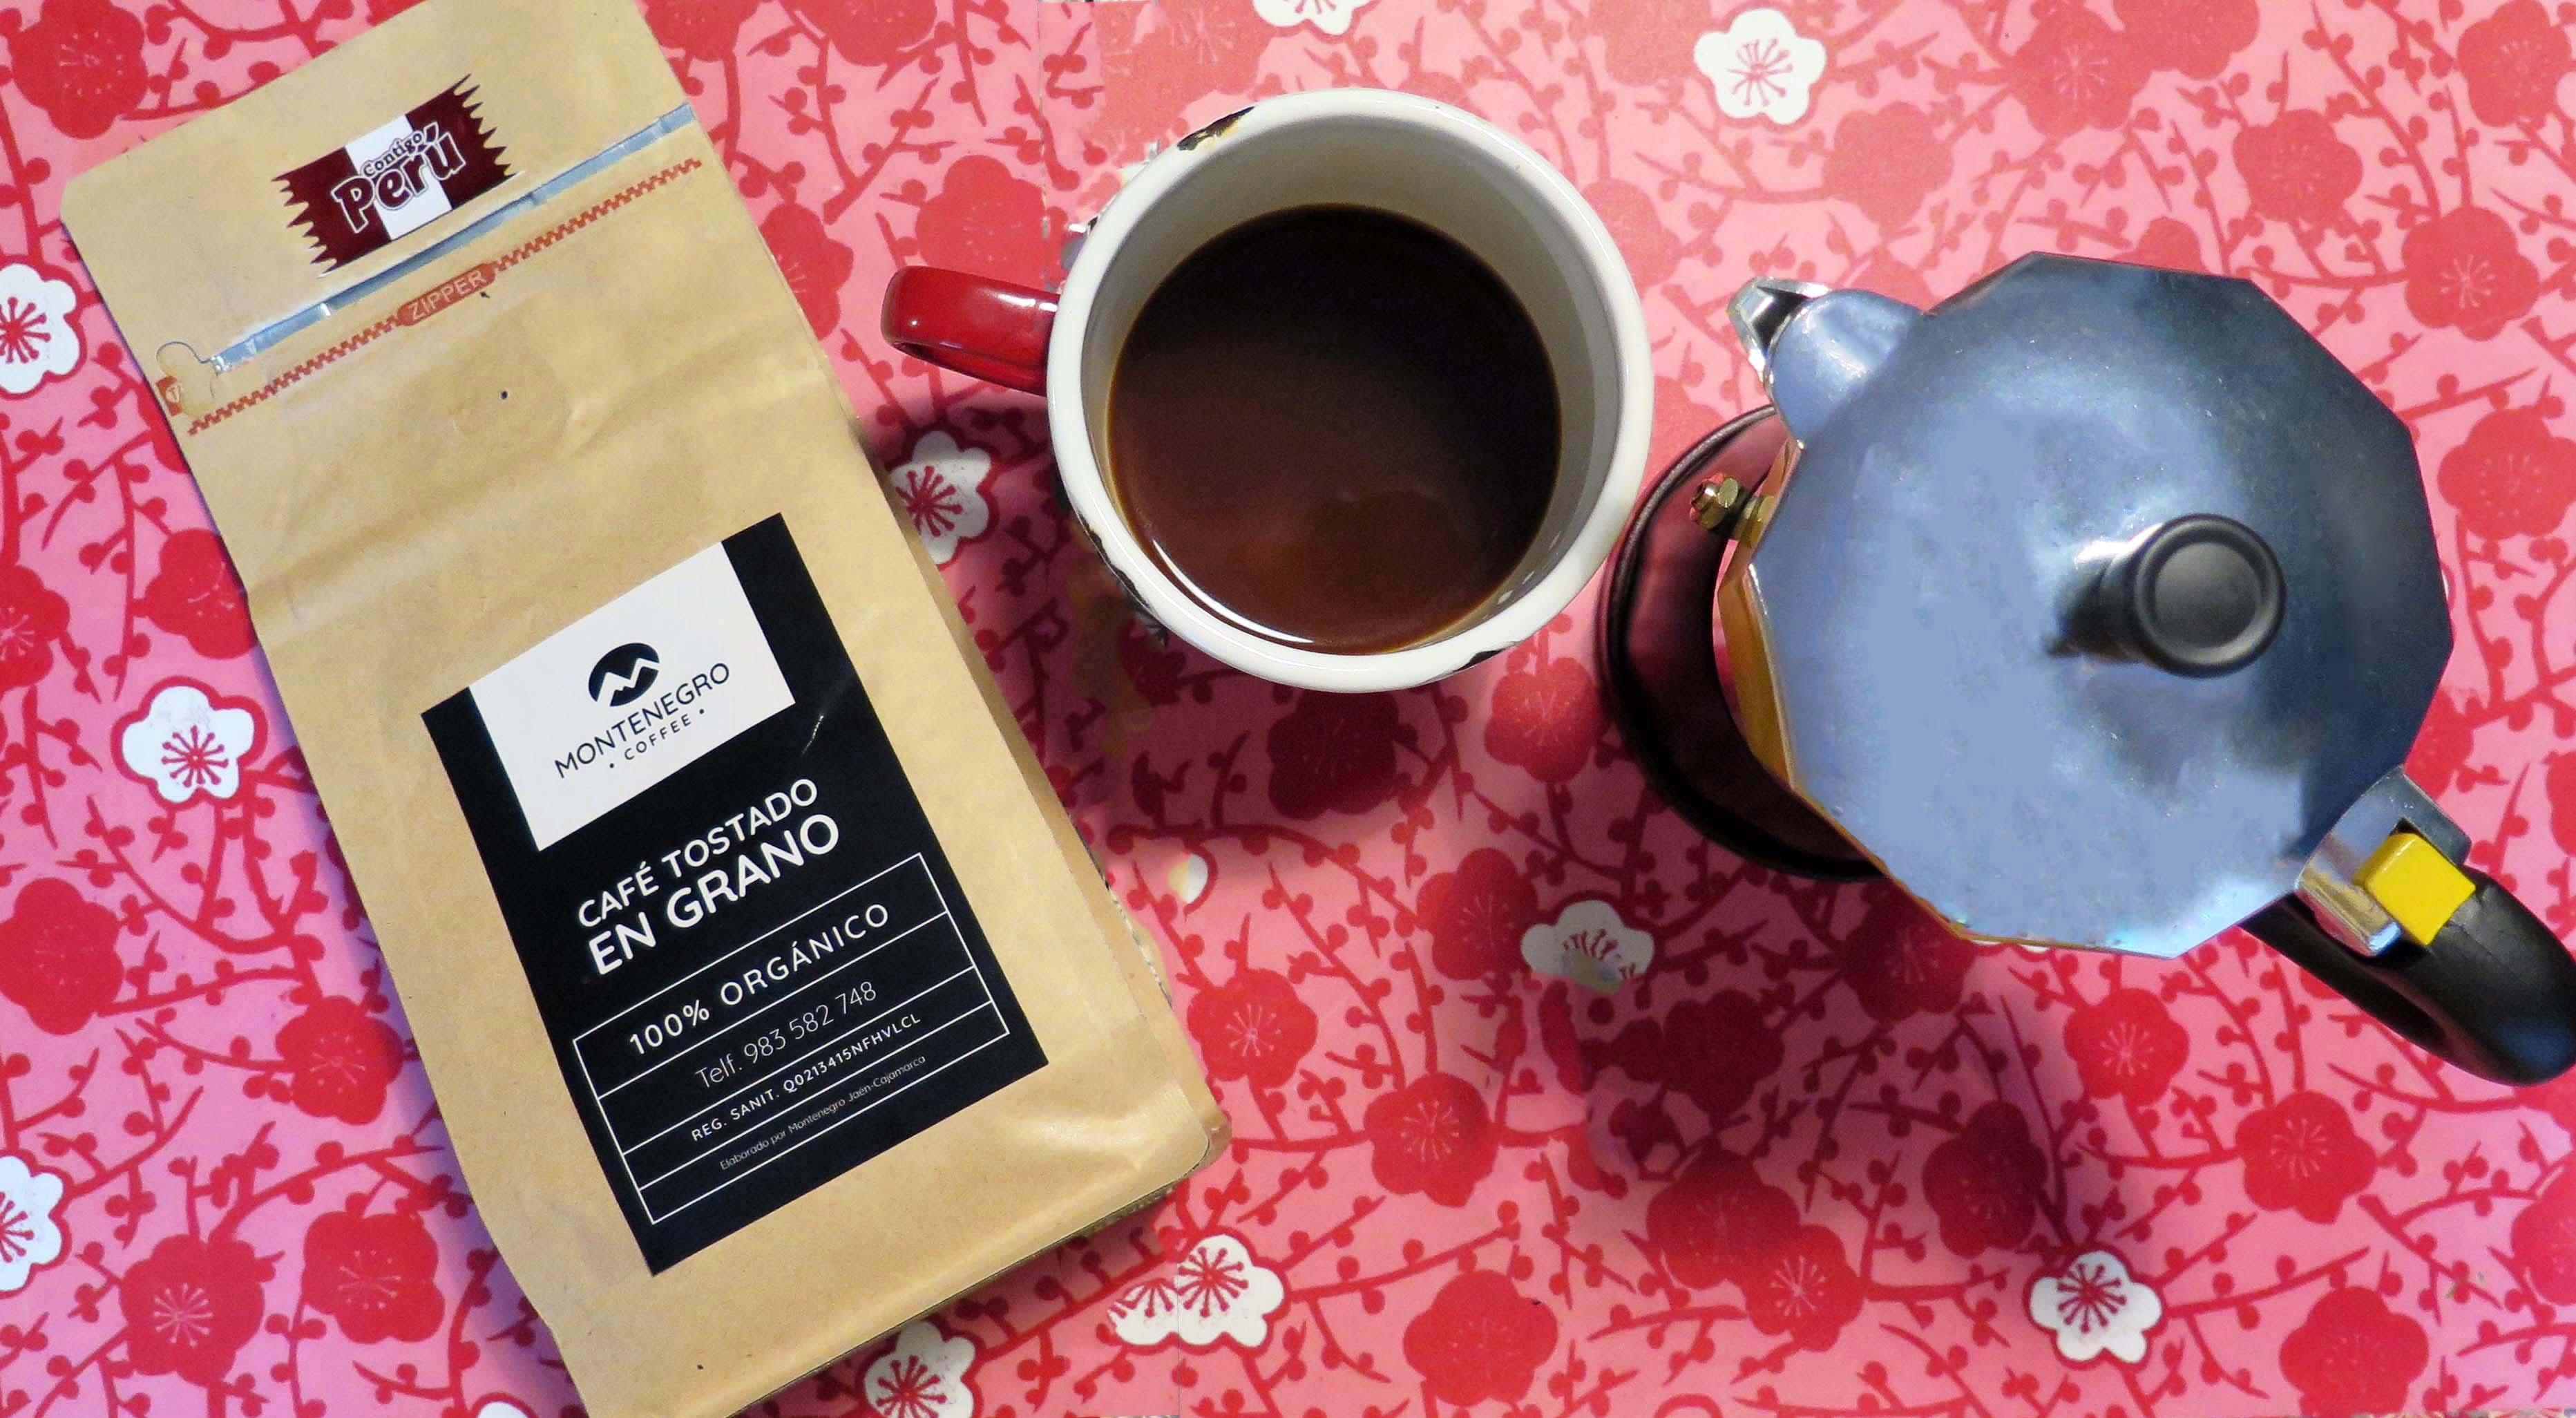 El café de la semana: Café Montenegro